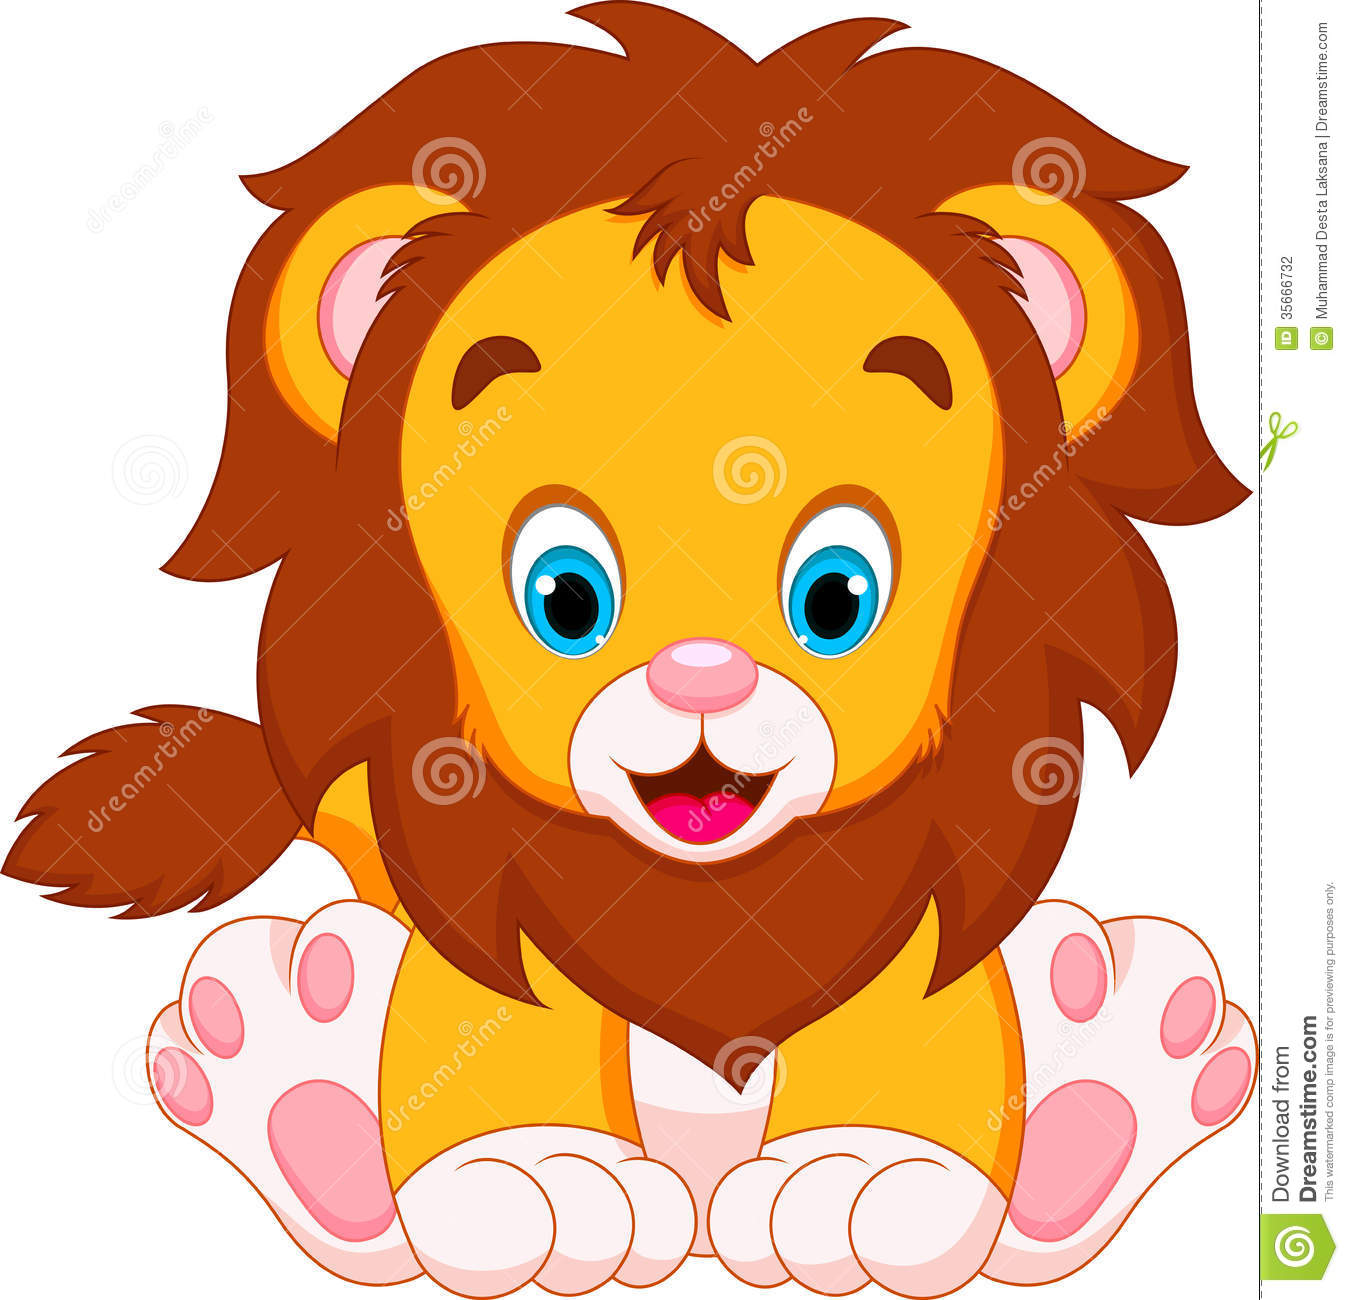 Cute Baby Lion Clipart-Cute Baby Lion Clipart-13